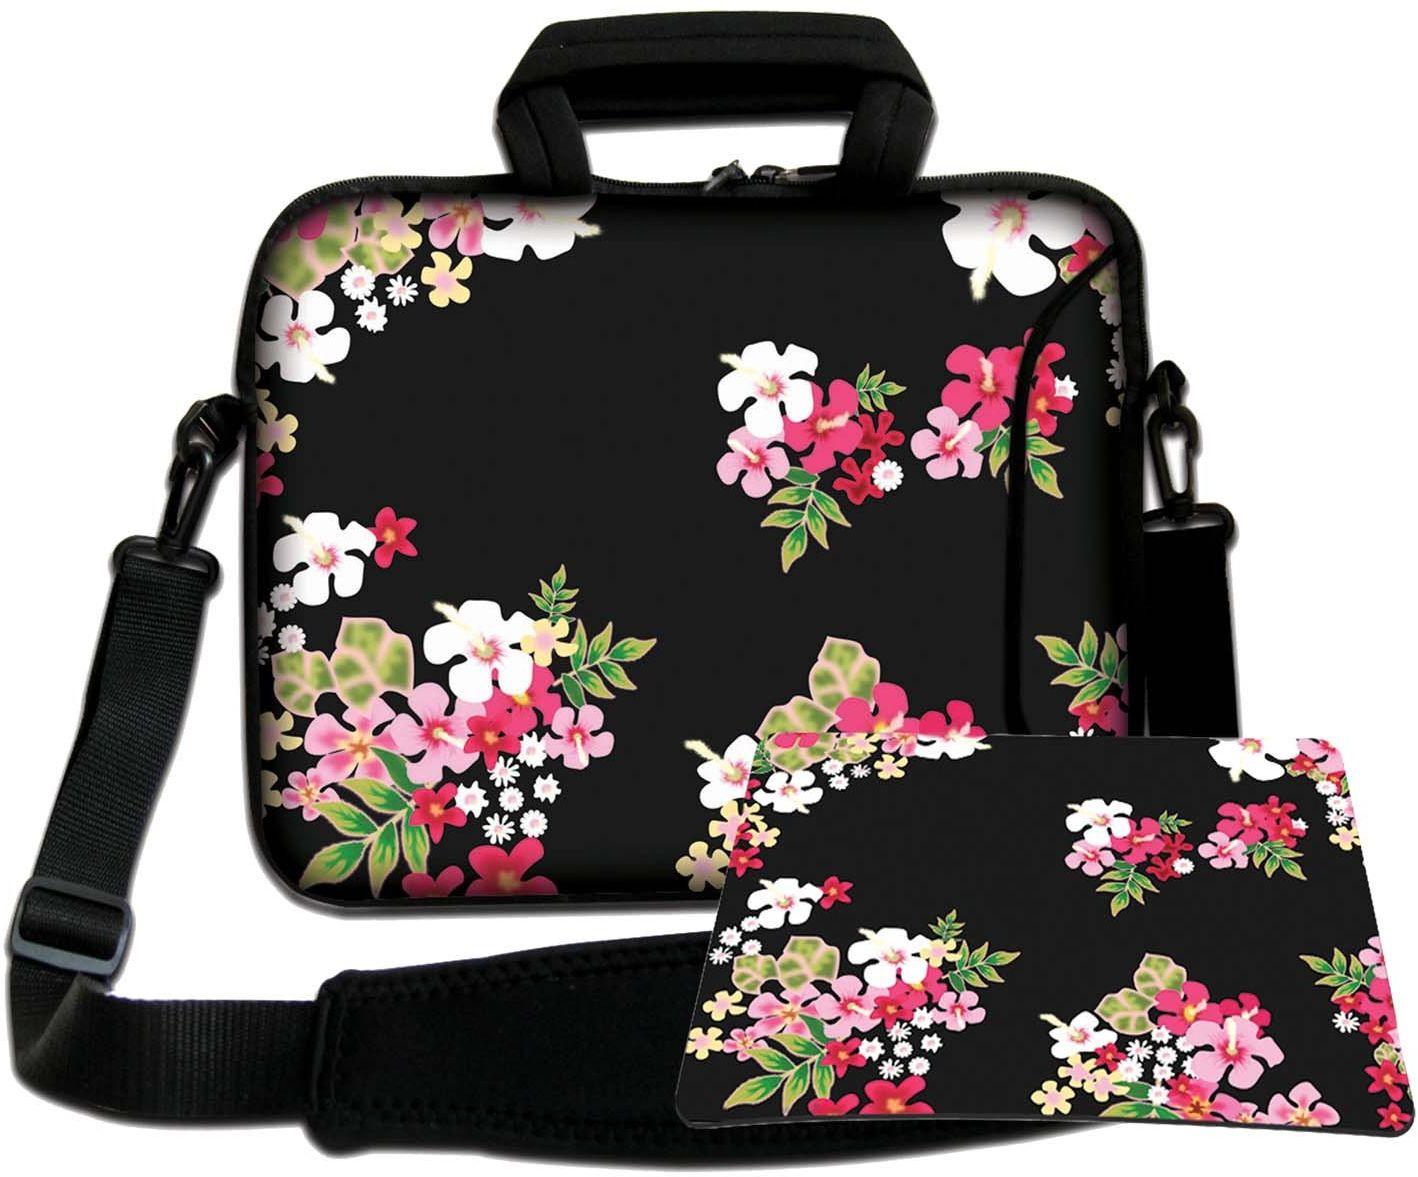 Luxburg torba na ramię torba na notebooka torba na laptopa torba z paskiem z neoprenu Plus Free Moupad! Do Apple, Acer, Asus, Chromebook, Dell, HP, Lenovo, Samsung, Sony itd. Laptop 10,2 cala